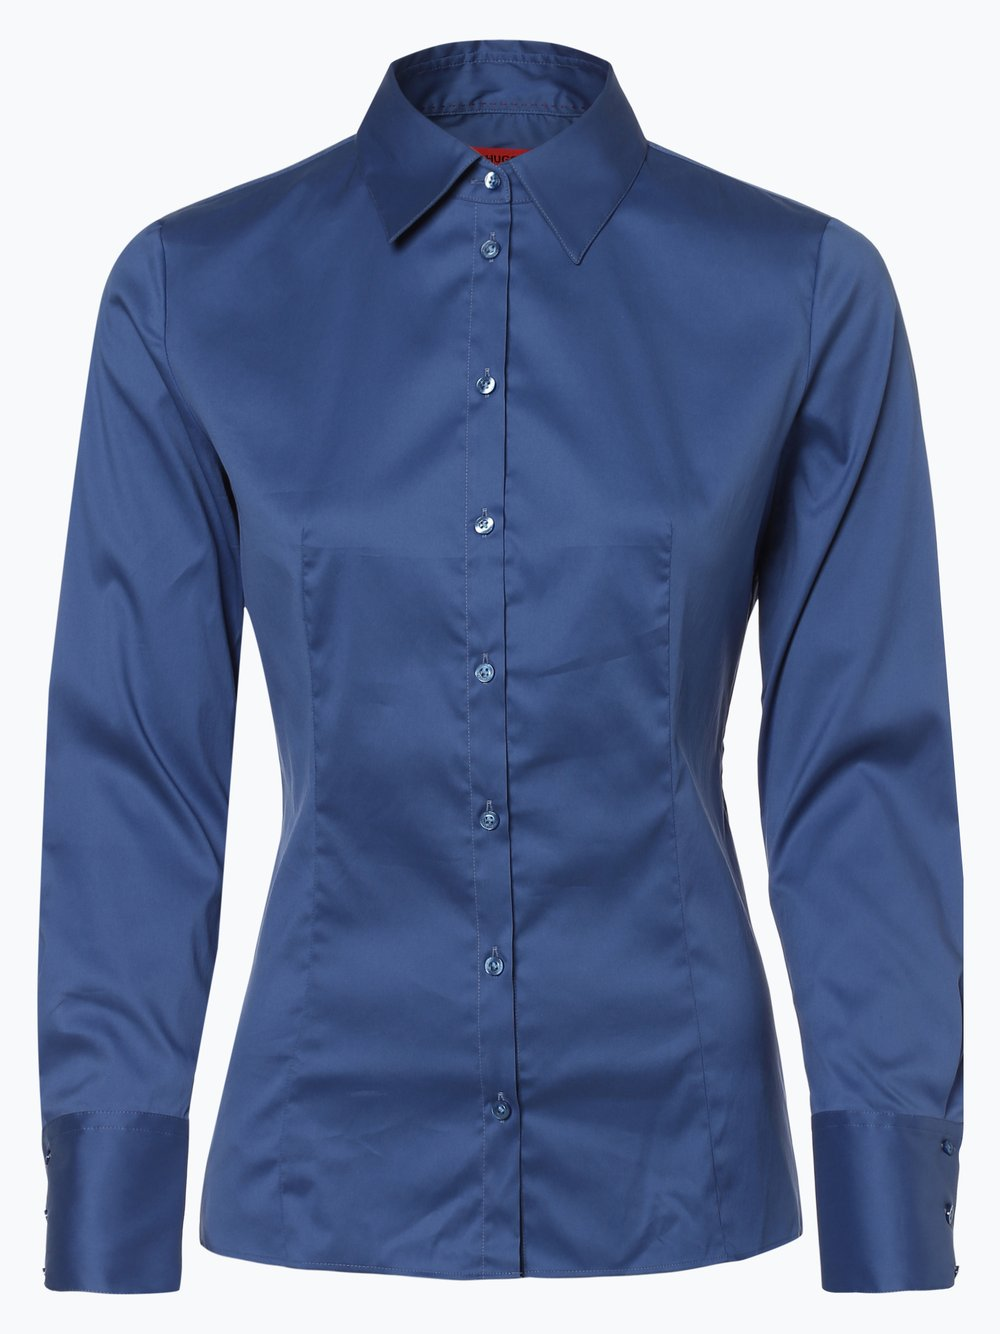 HUGO - Bluzka damska – The Fitted Shirt, niebieski